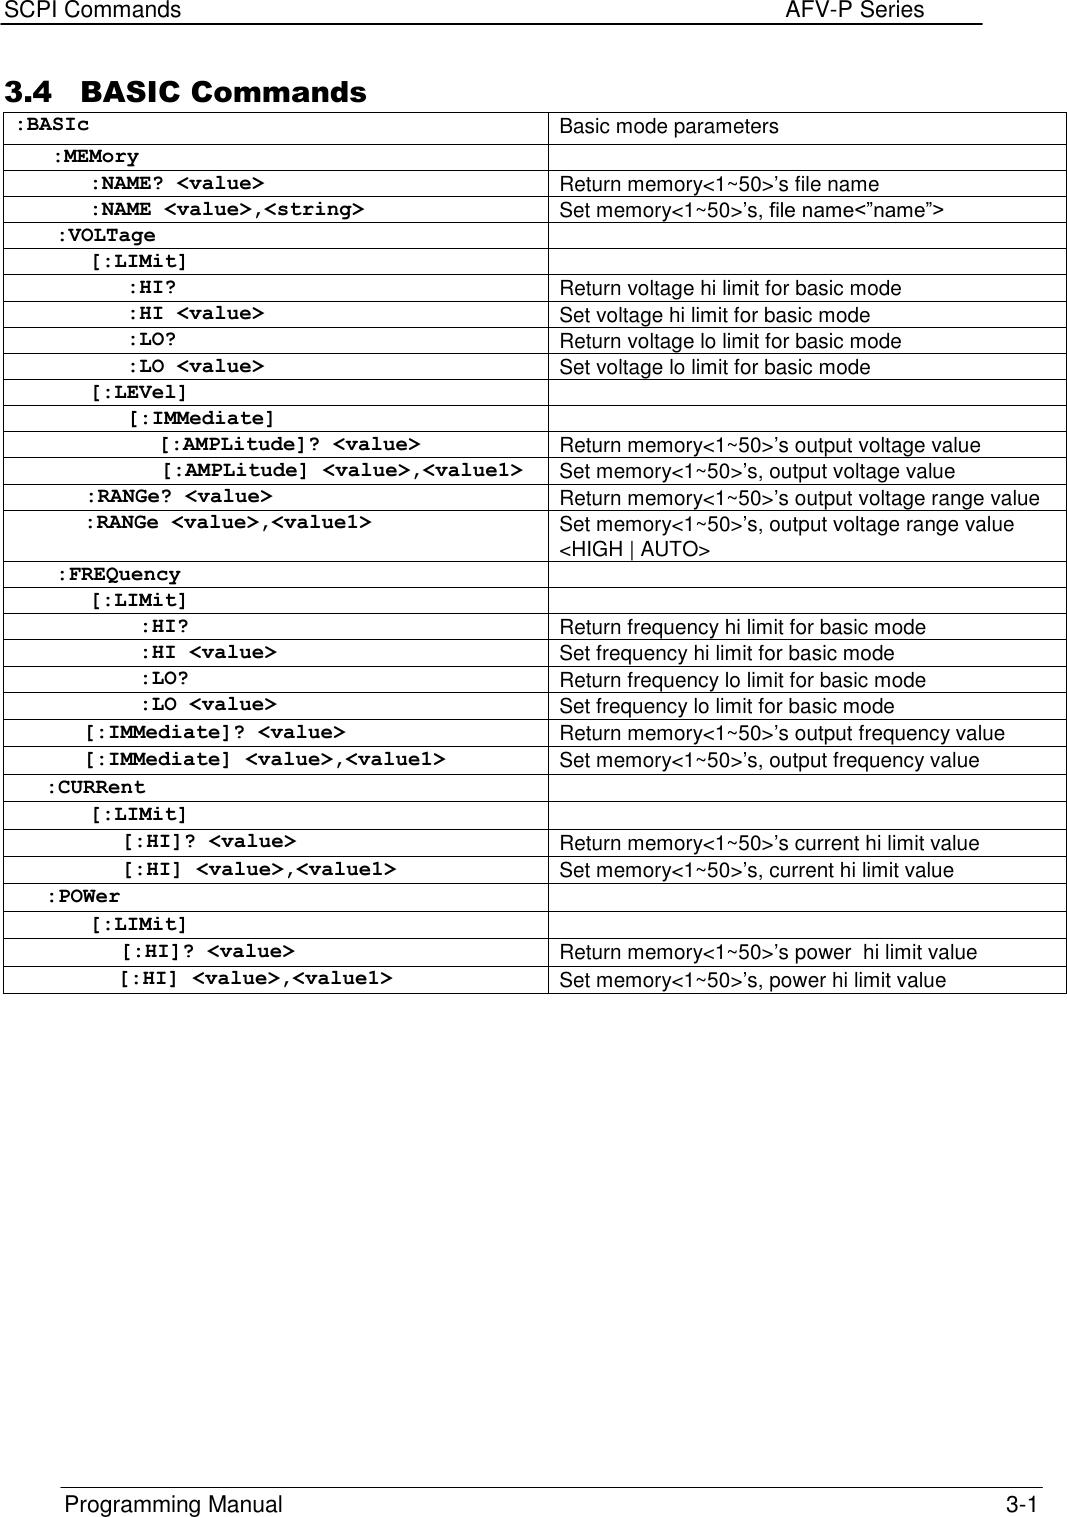 Elgar AFV P Series Programming Manual (SCPI)